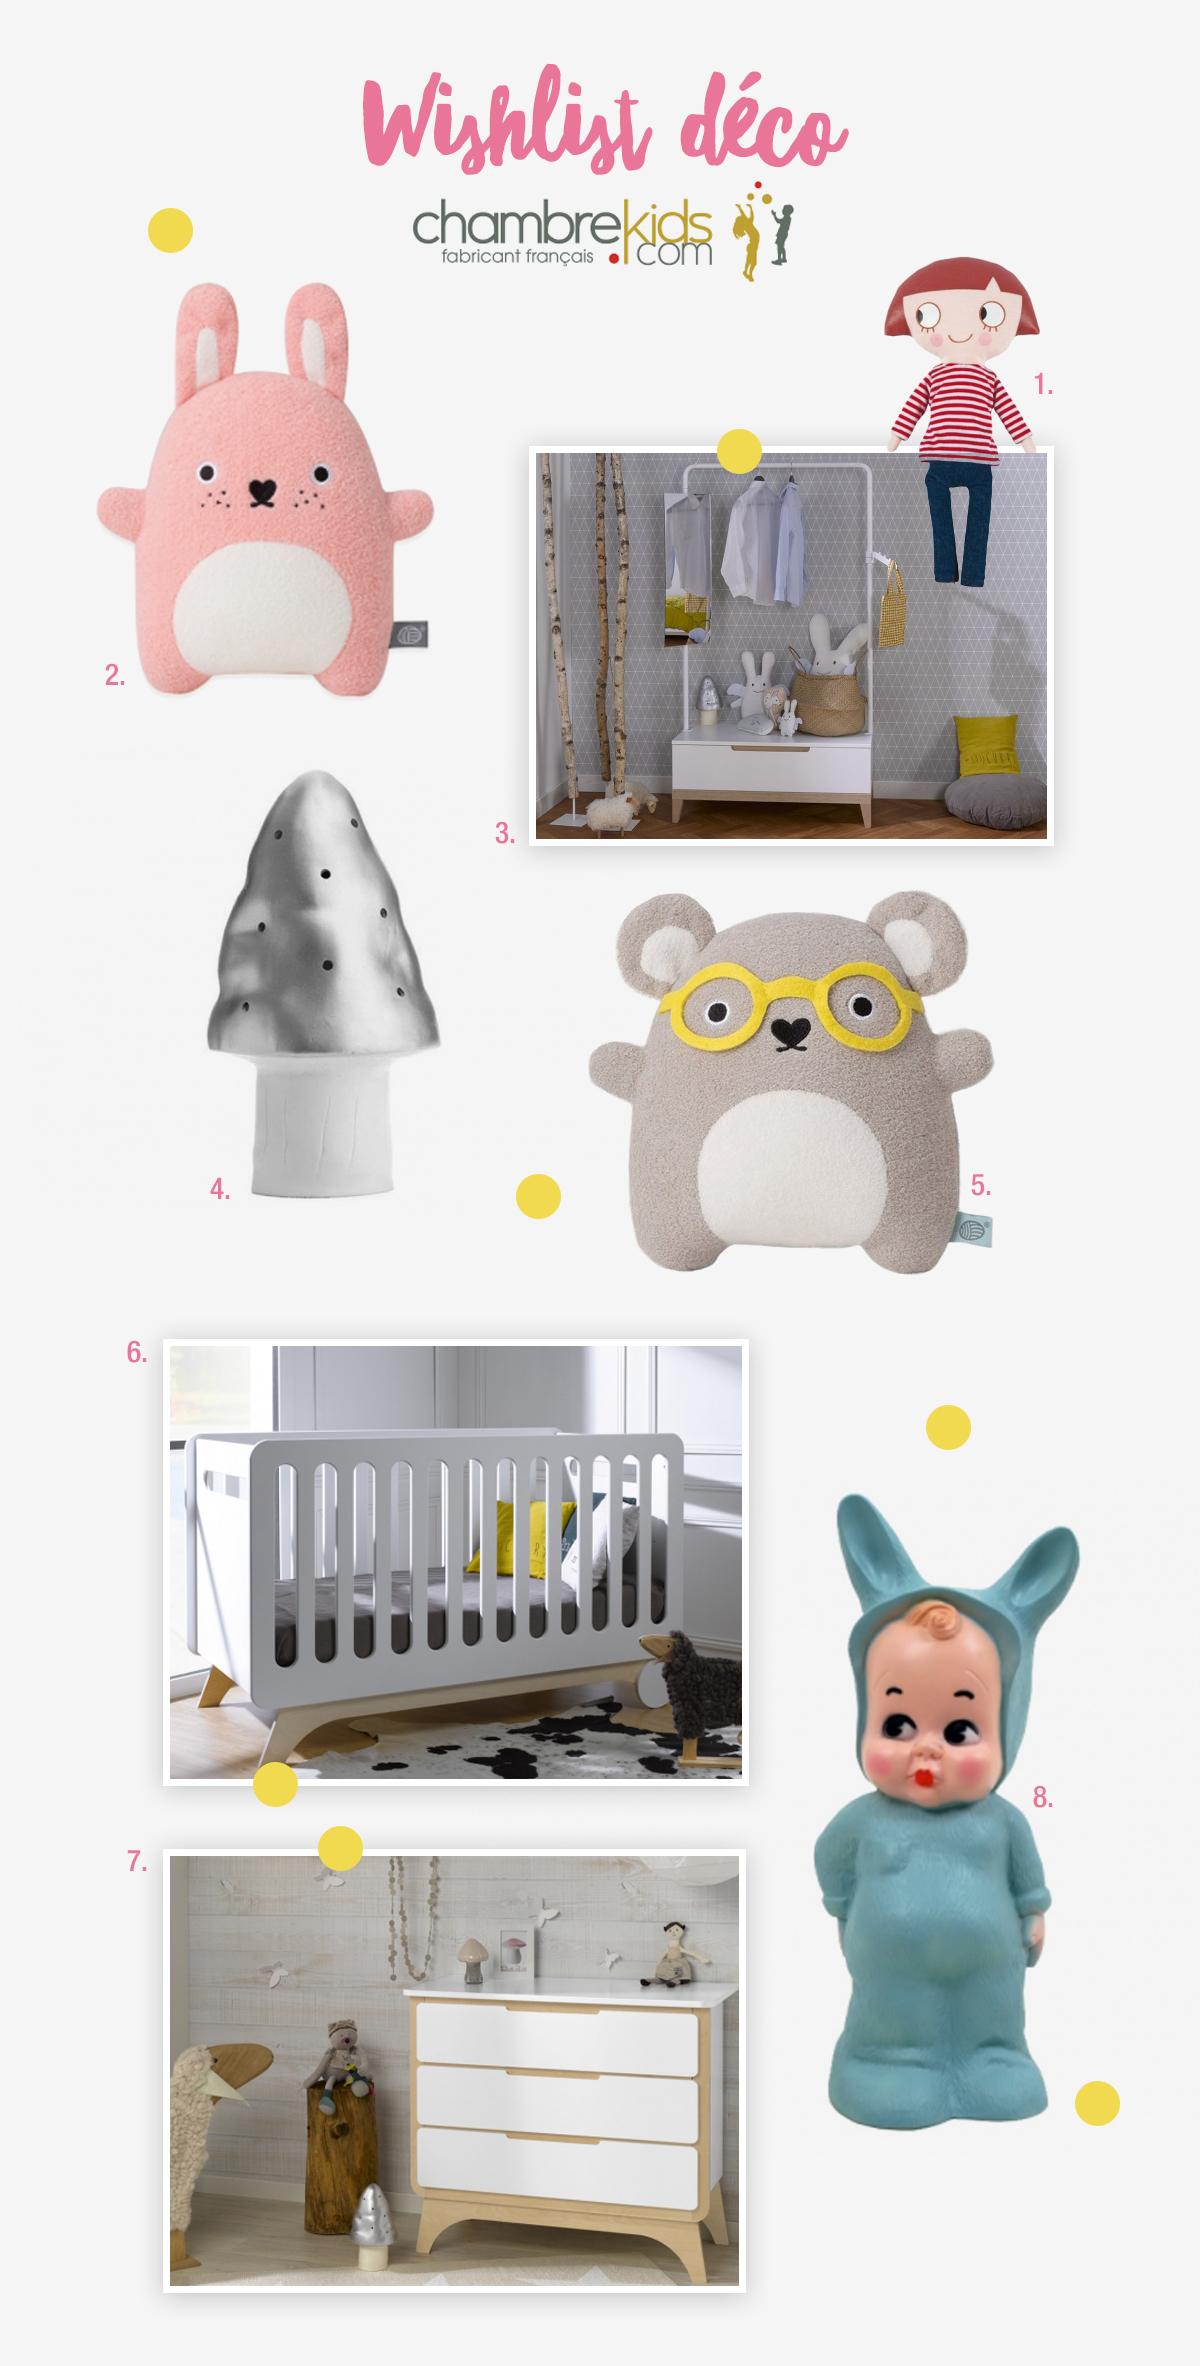 selection_chambre_kids